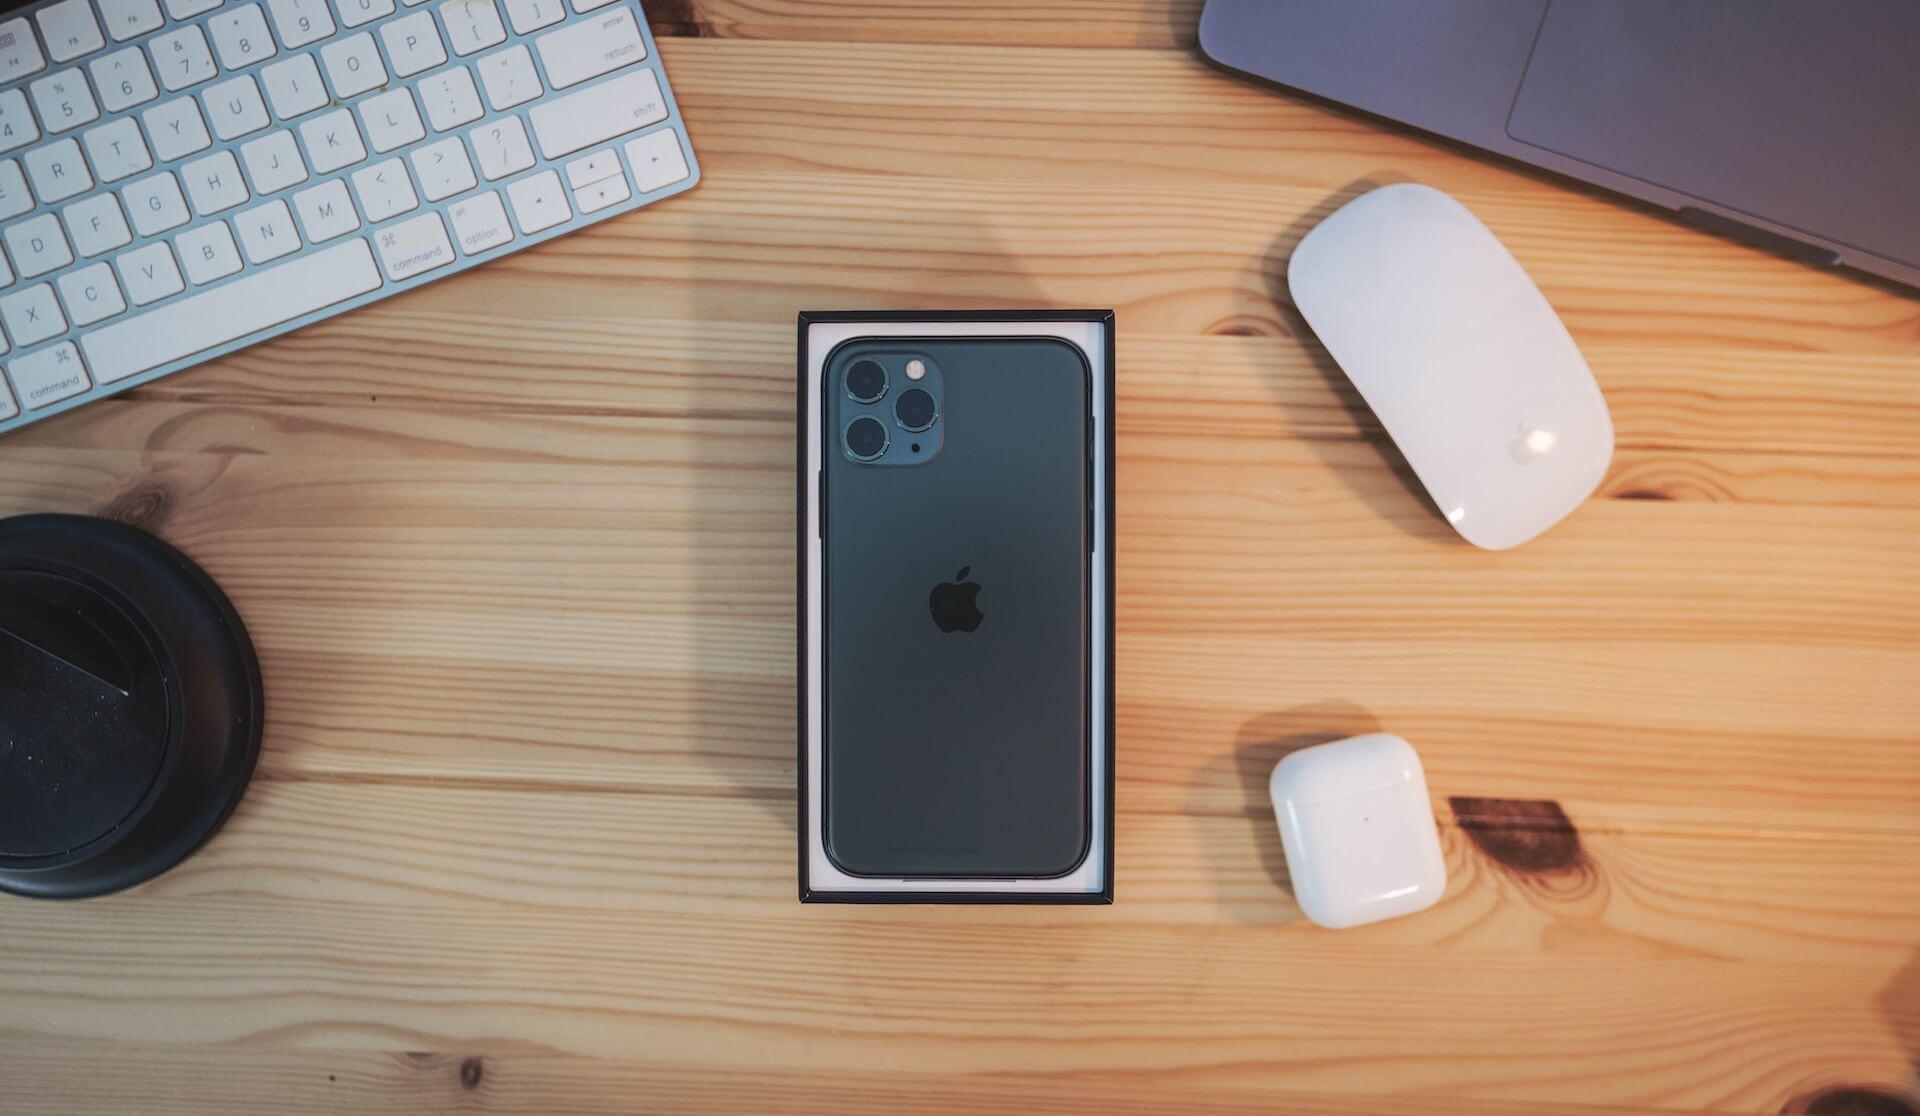 iPhone 11 Pro Maxのボディ強度はどのくらい?YouTube上の検証動画が話題 tech190924_iphone11_1